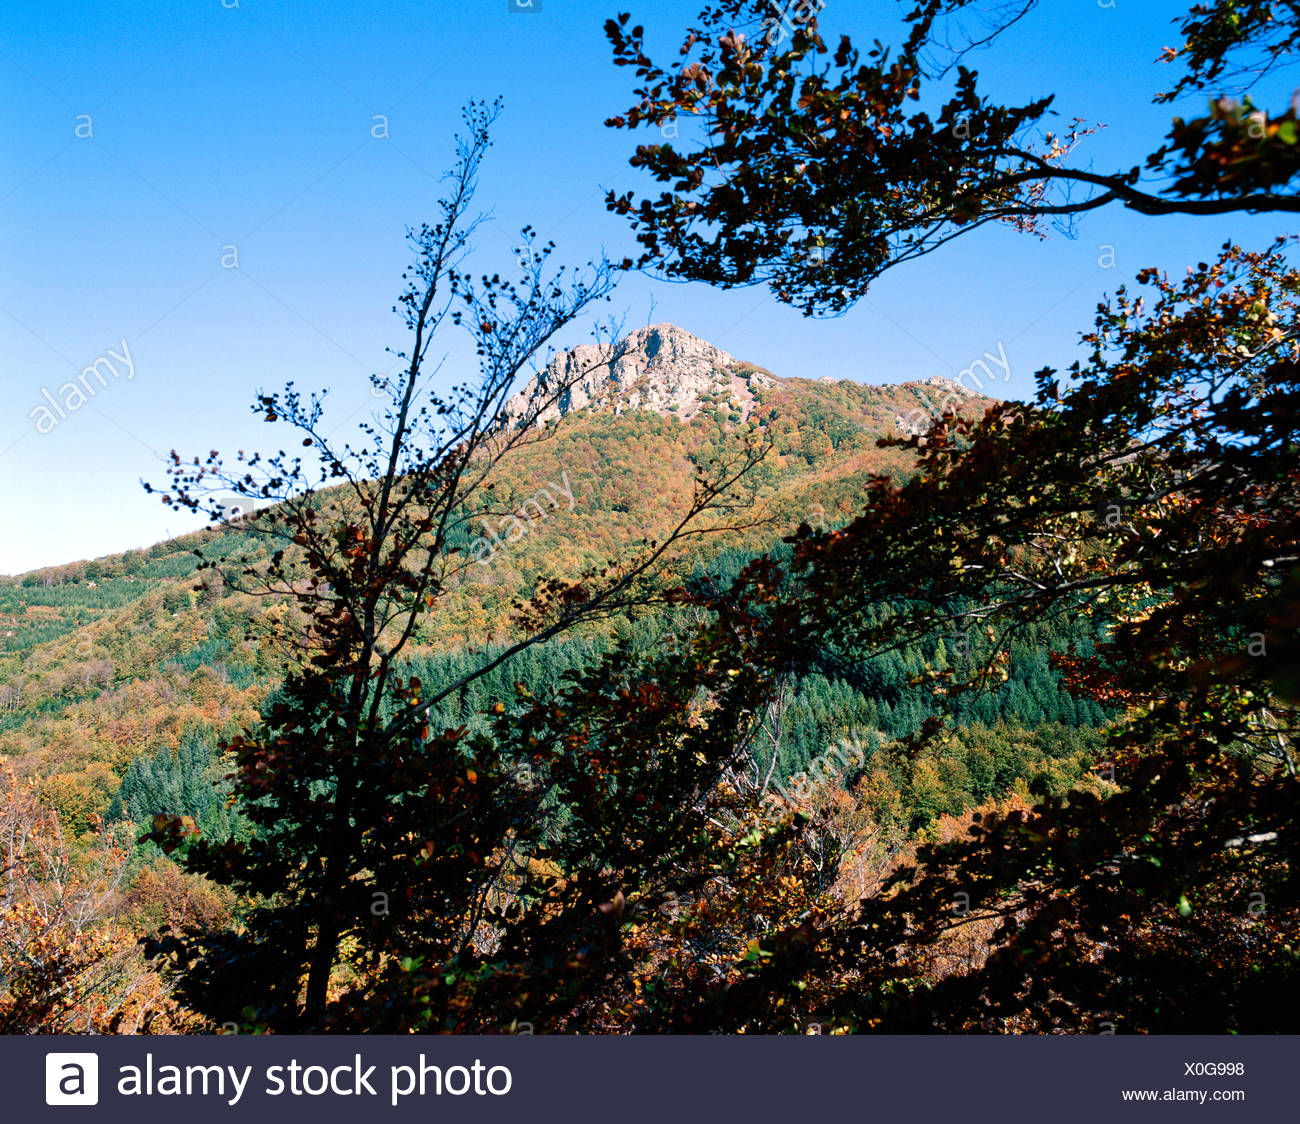 Les Agudes (1703 m). Montseny. Barcelona. Cataluña, Spain - Stock Image